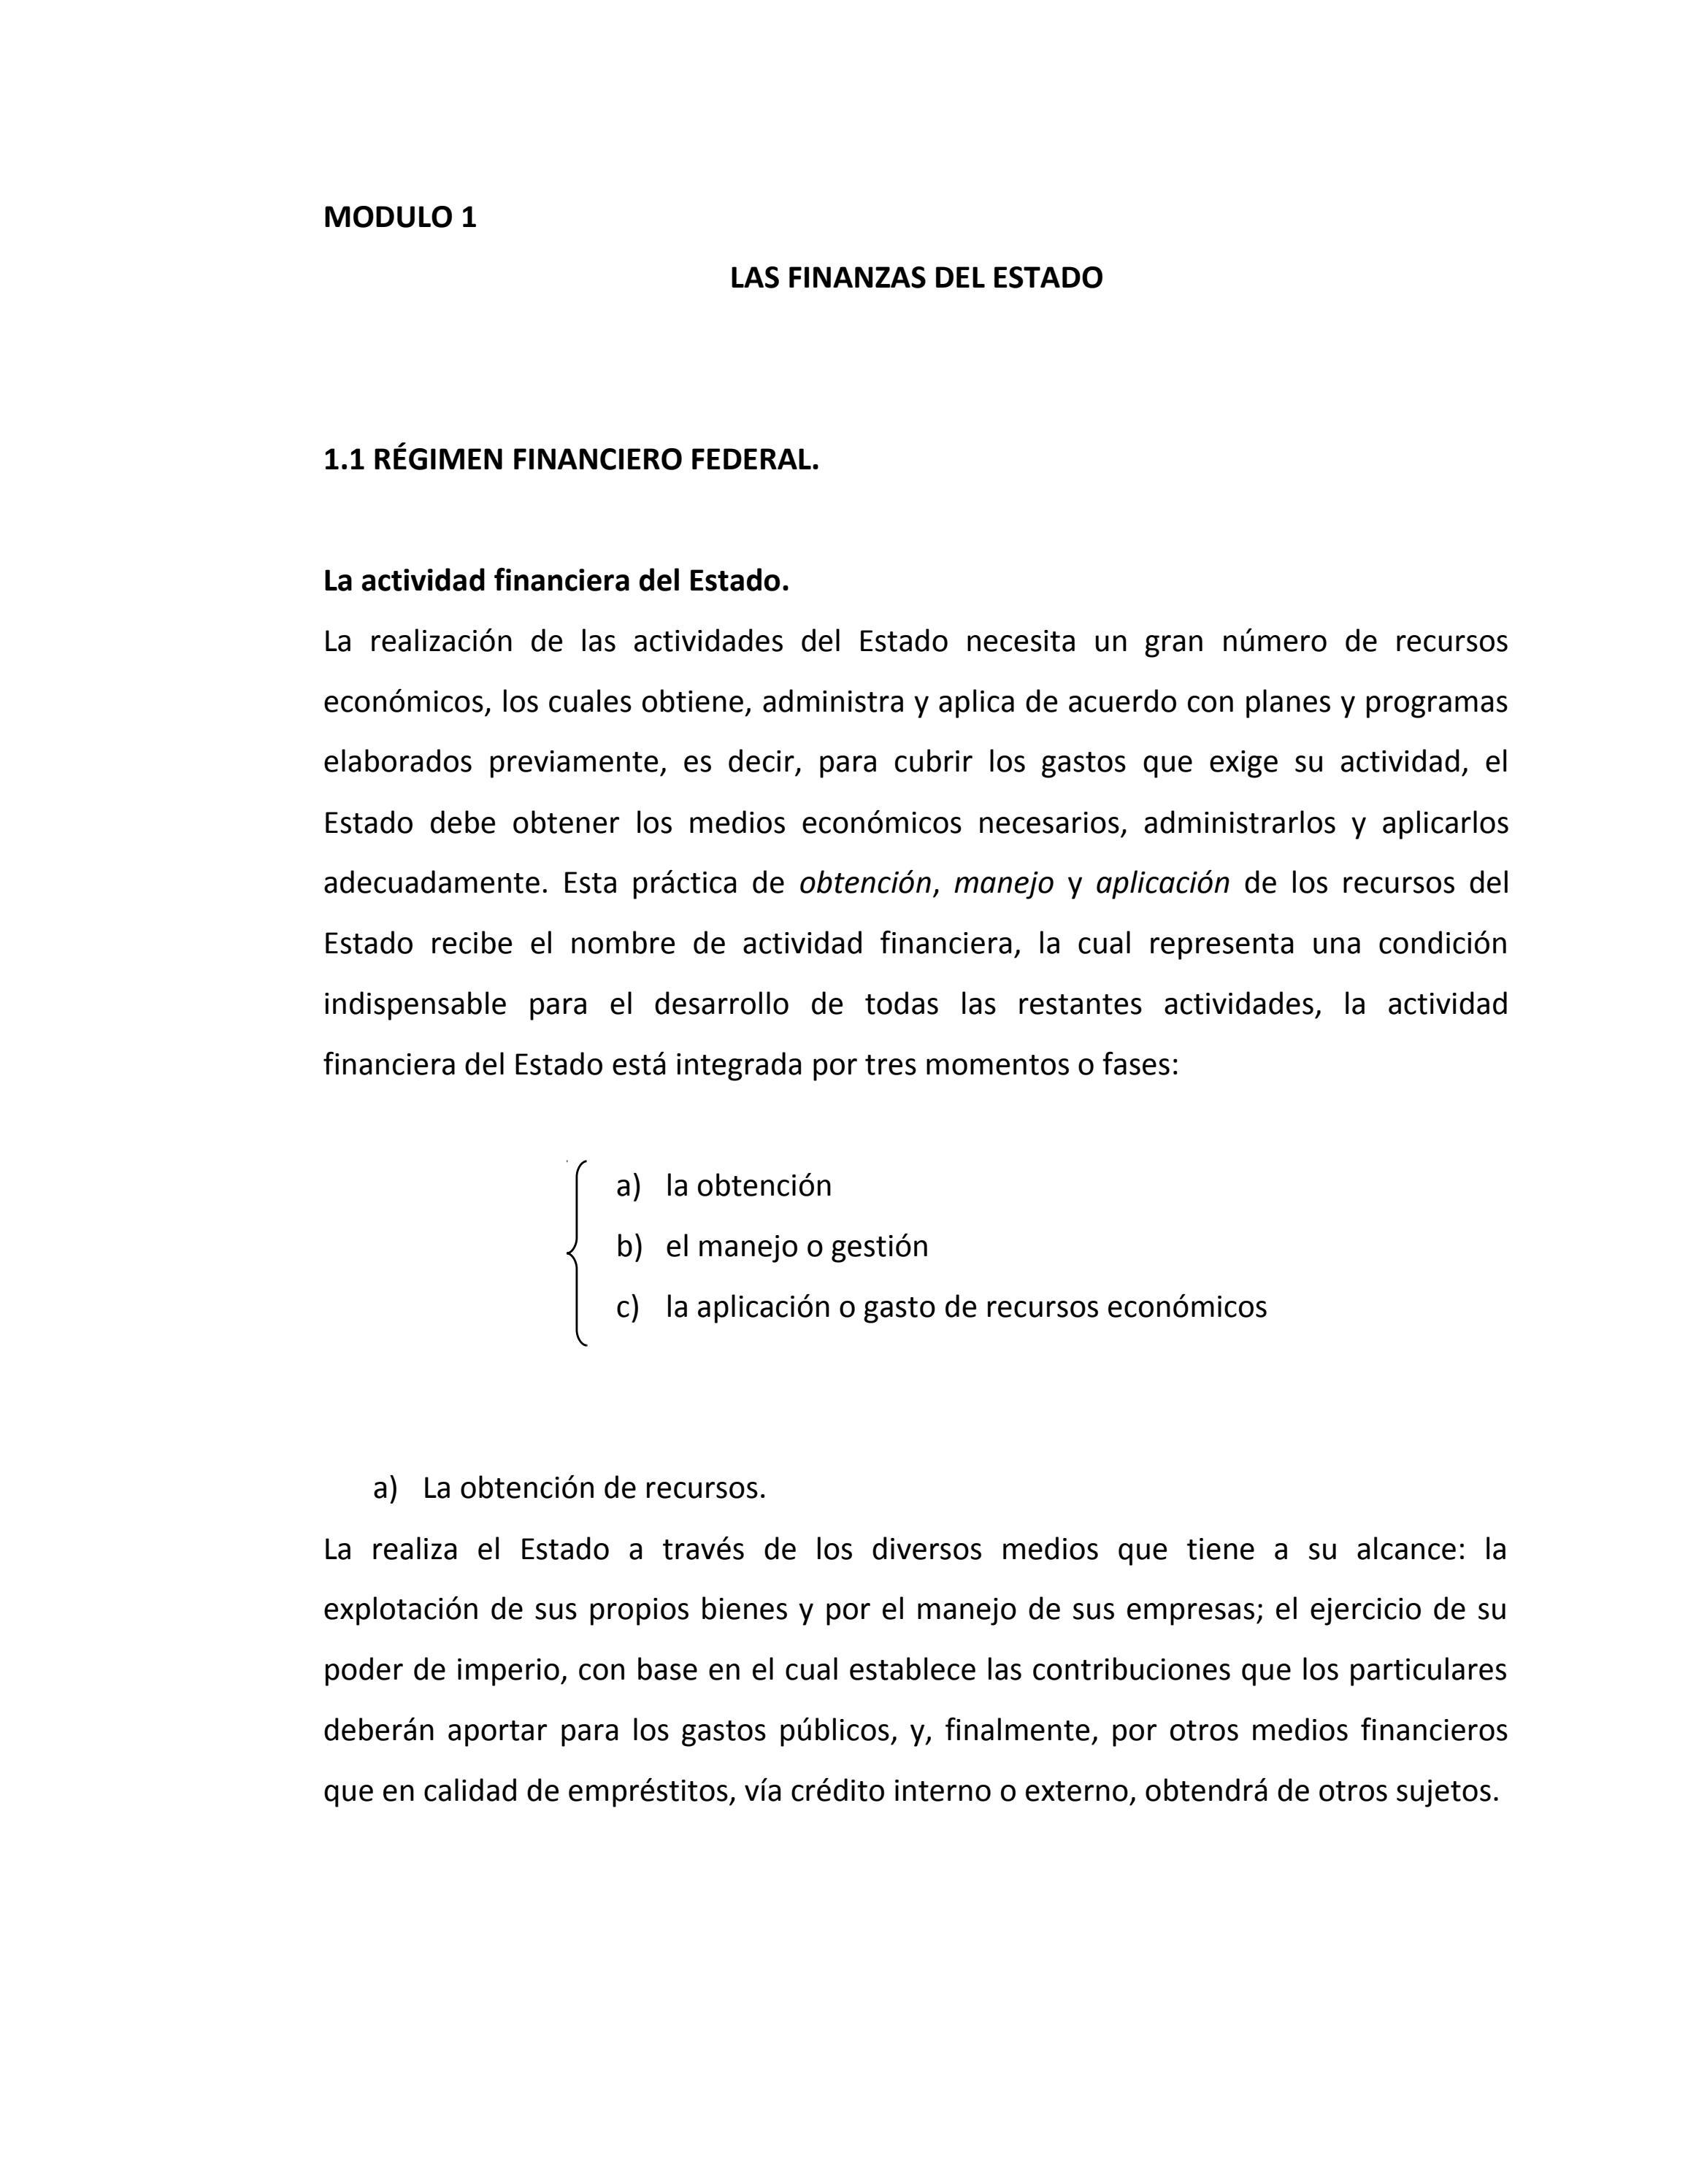 Derecho Administrativo Ii Módulo 1 By Cristina Noé Issuu